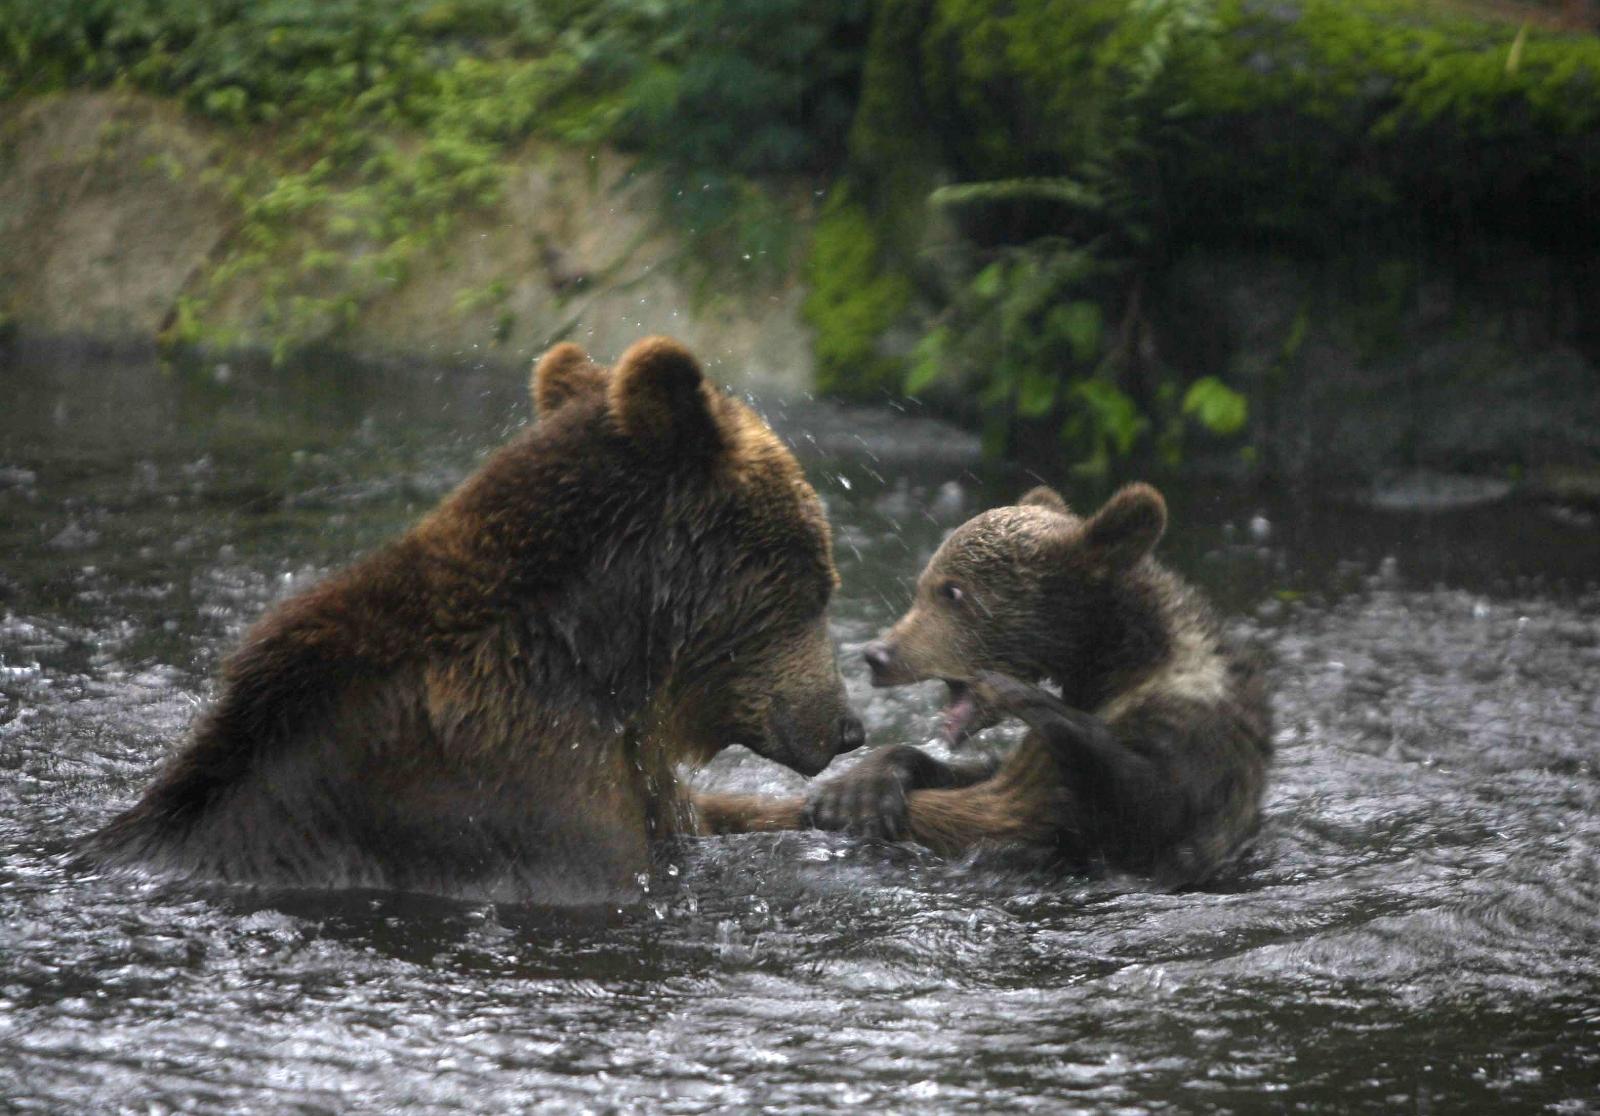 Alaskan brown bear plays with cub